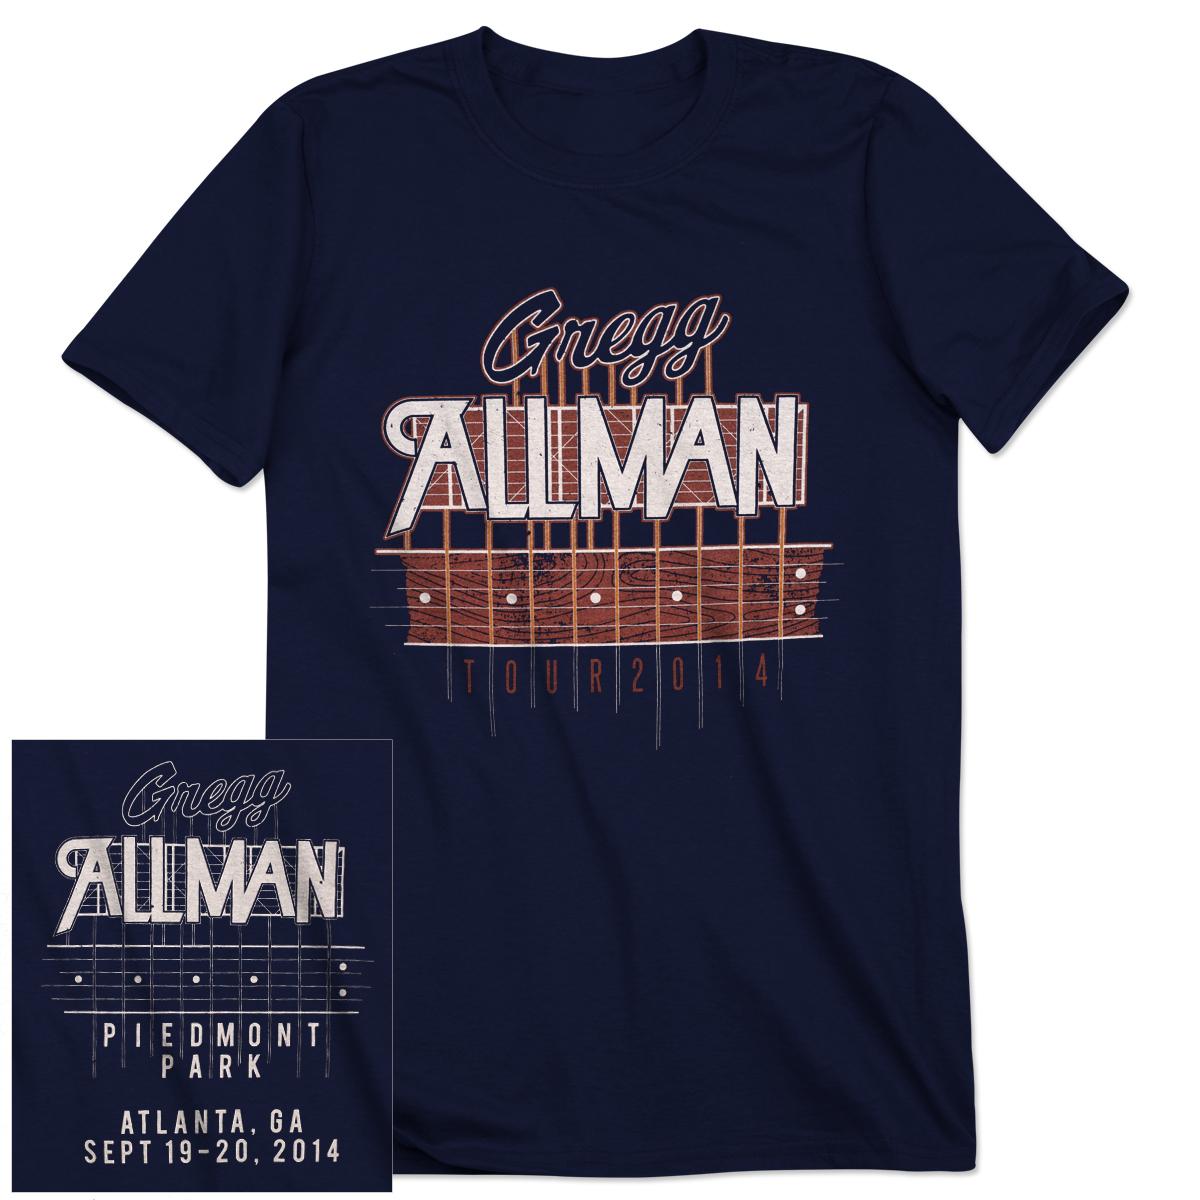 Gregg Allman Atlanta Event T-Shirt